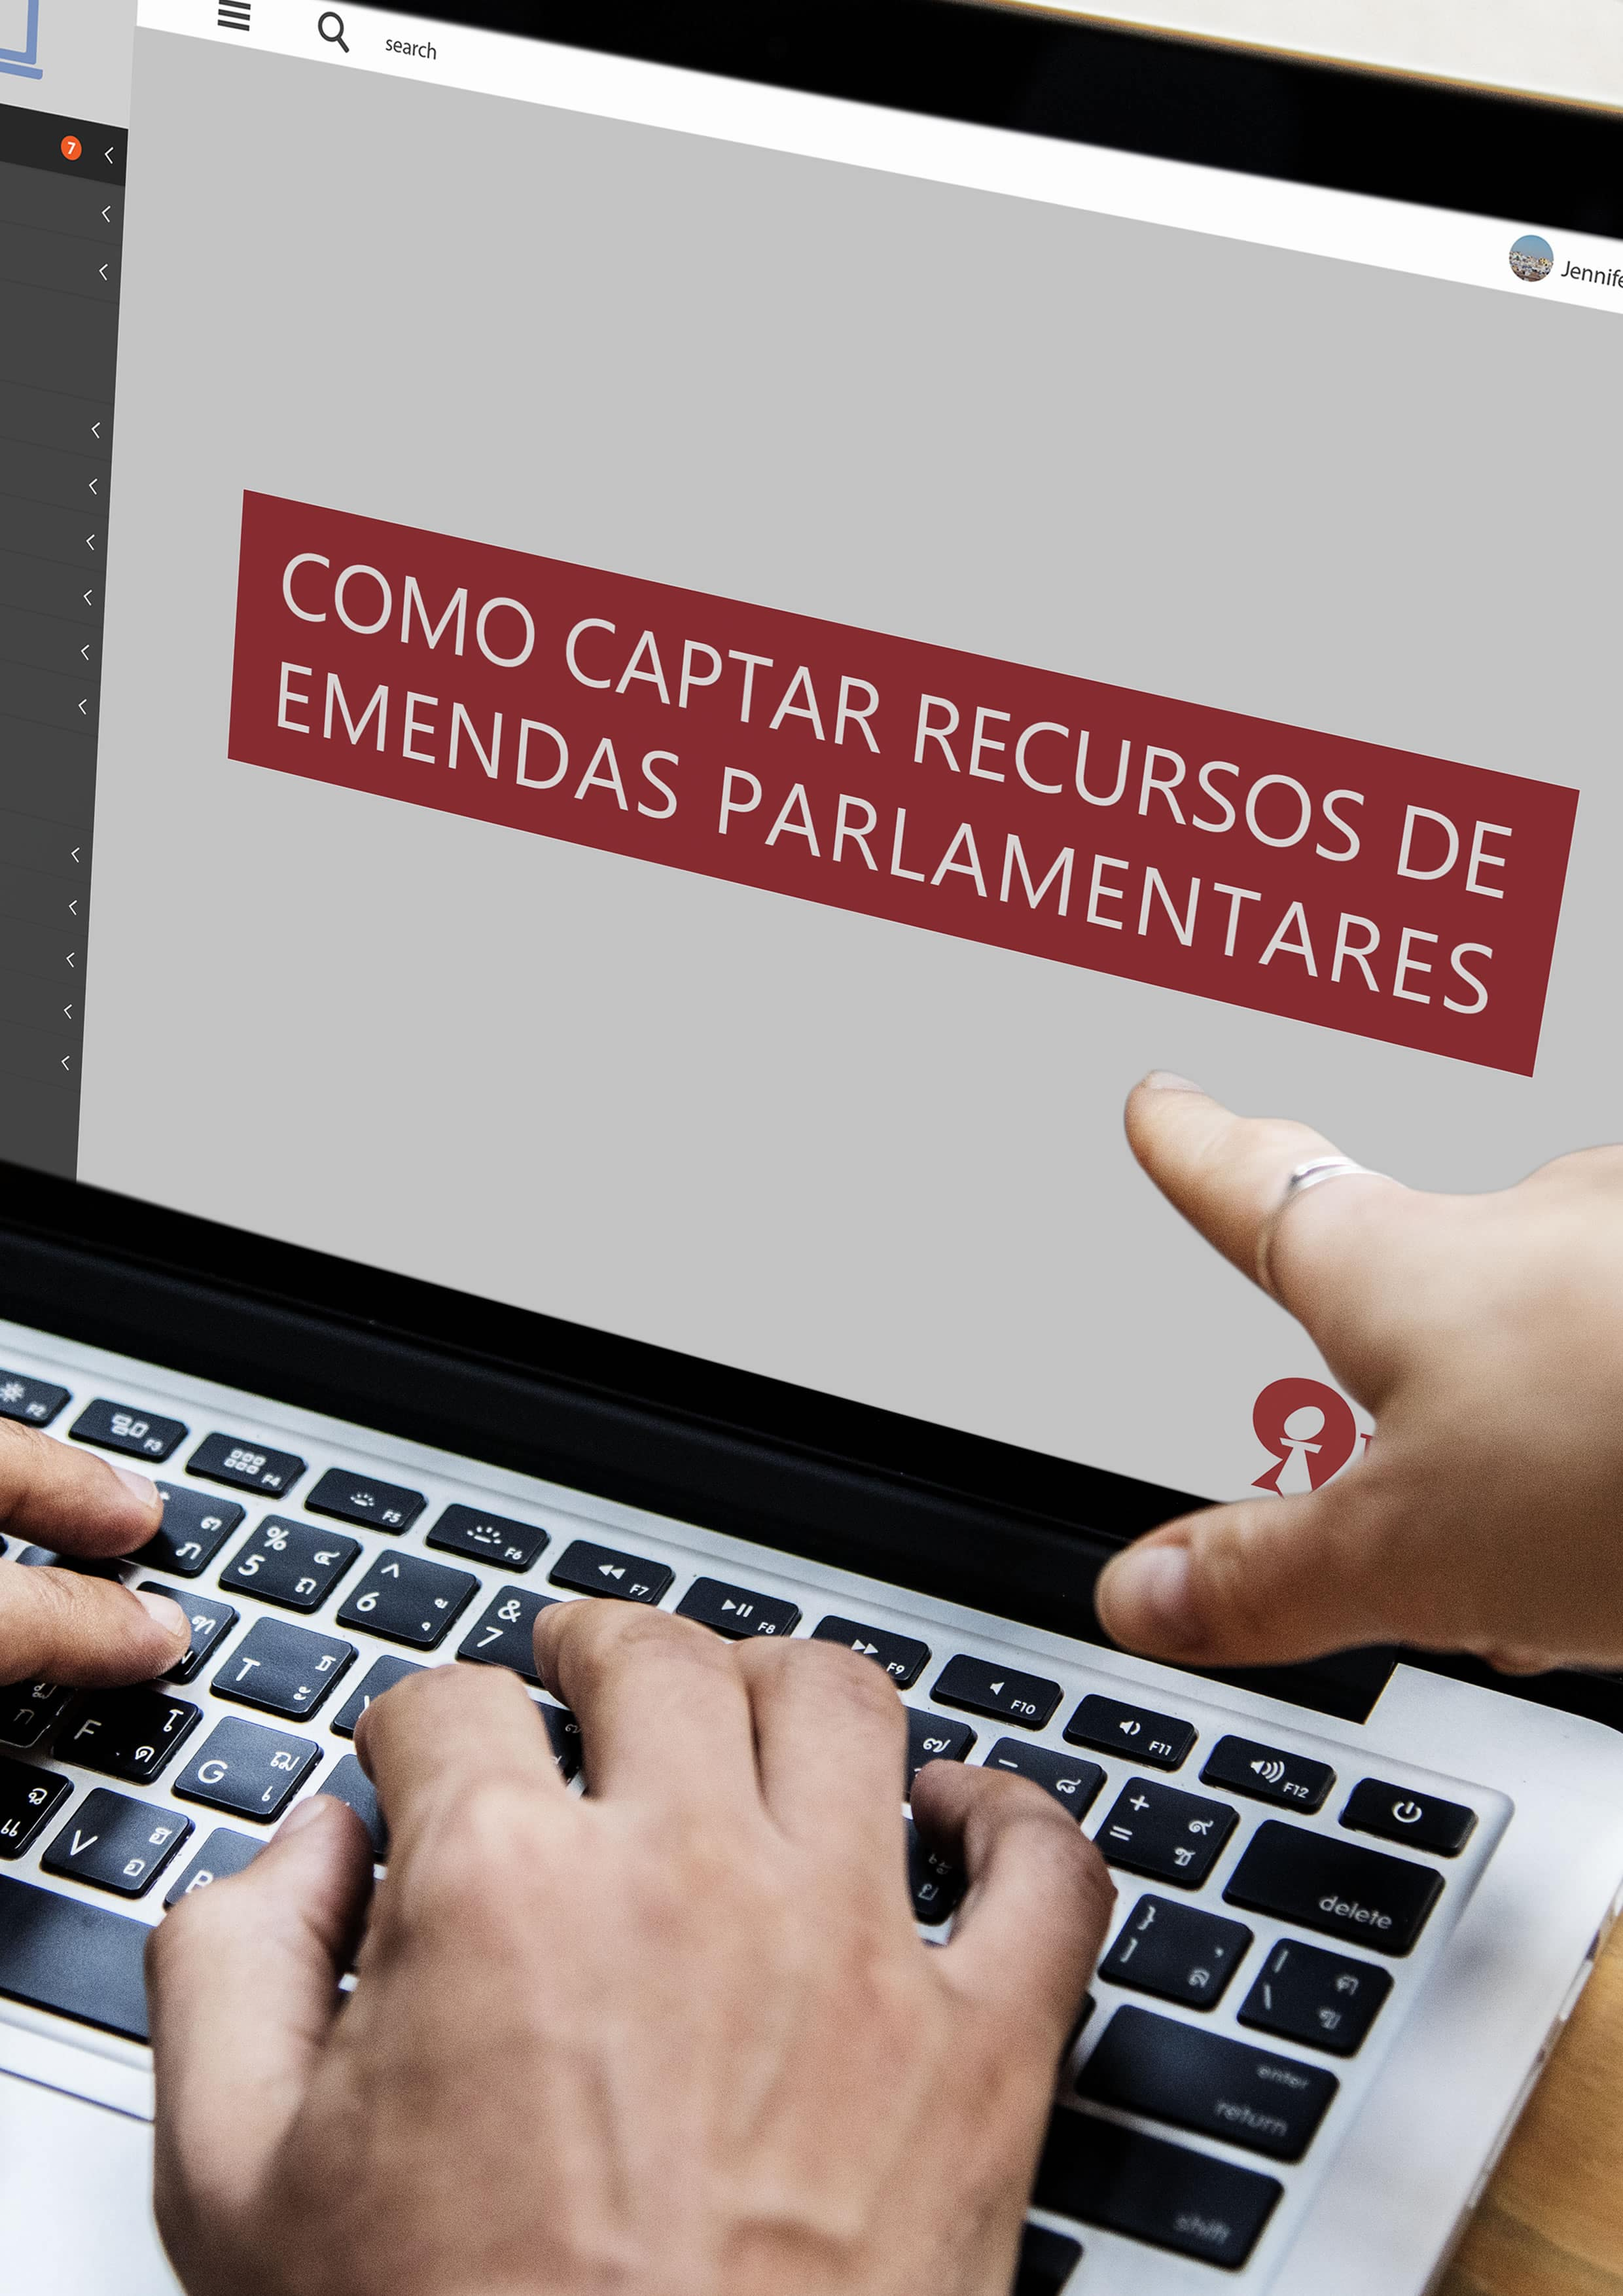 Como captar recursos de emendas parlamentares